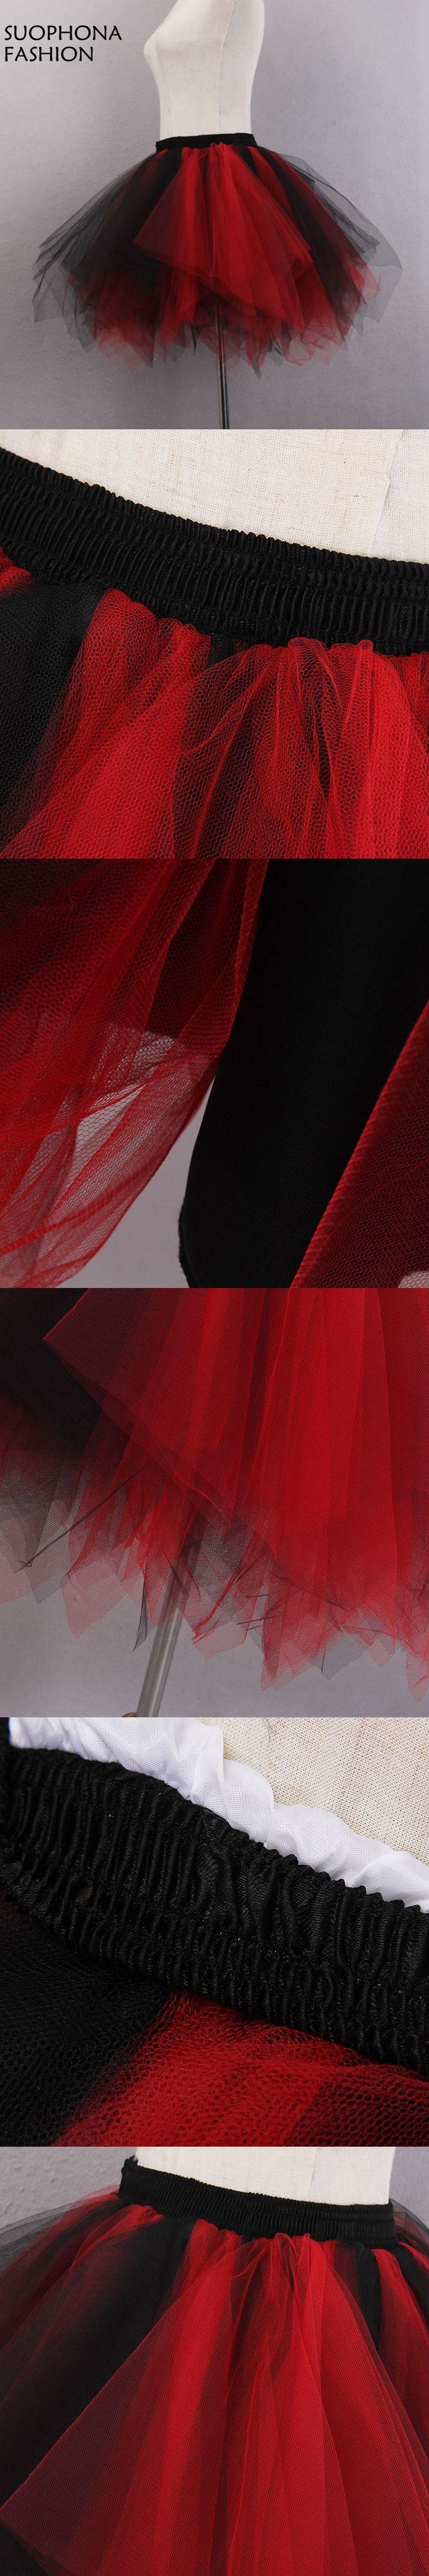 New Arrival In stock Red Black Short Mini Petticoat Crinoline Saiote onderrok Enaguas Jupon mariage Petticoat halloween